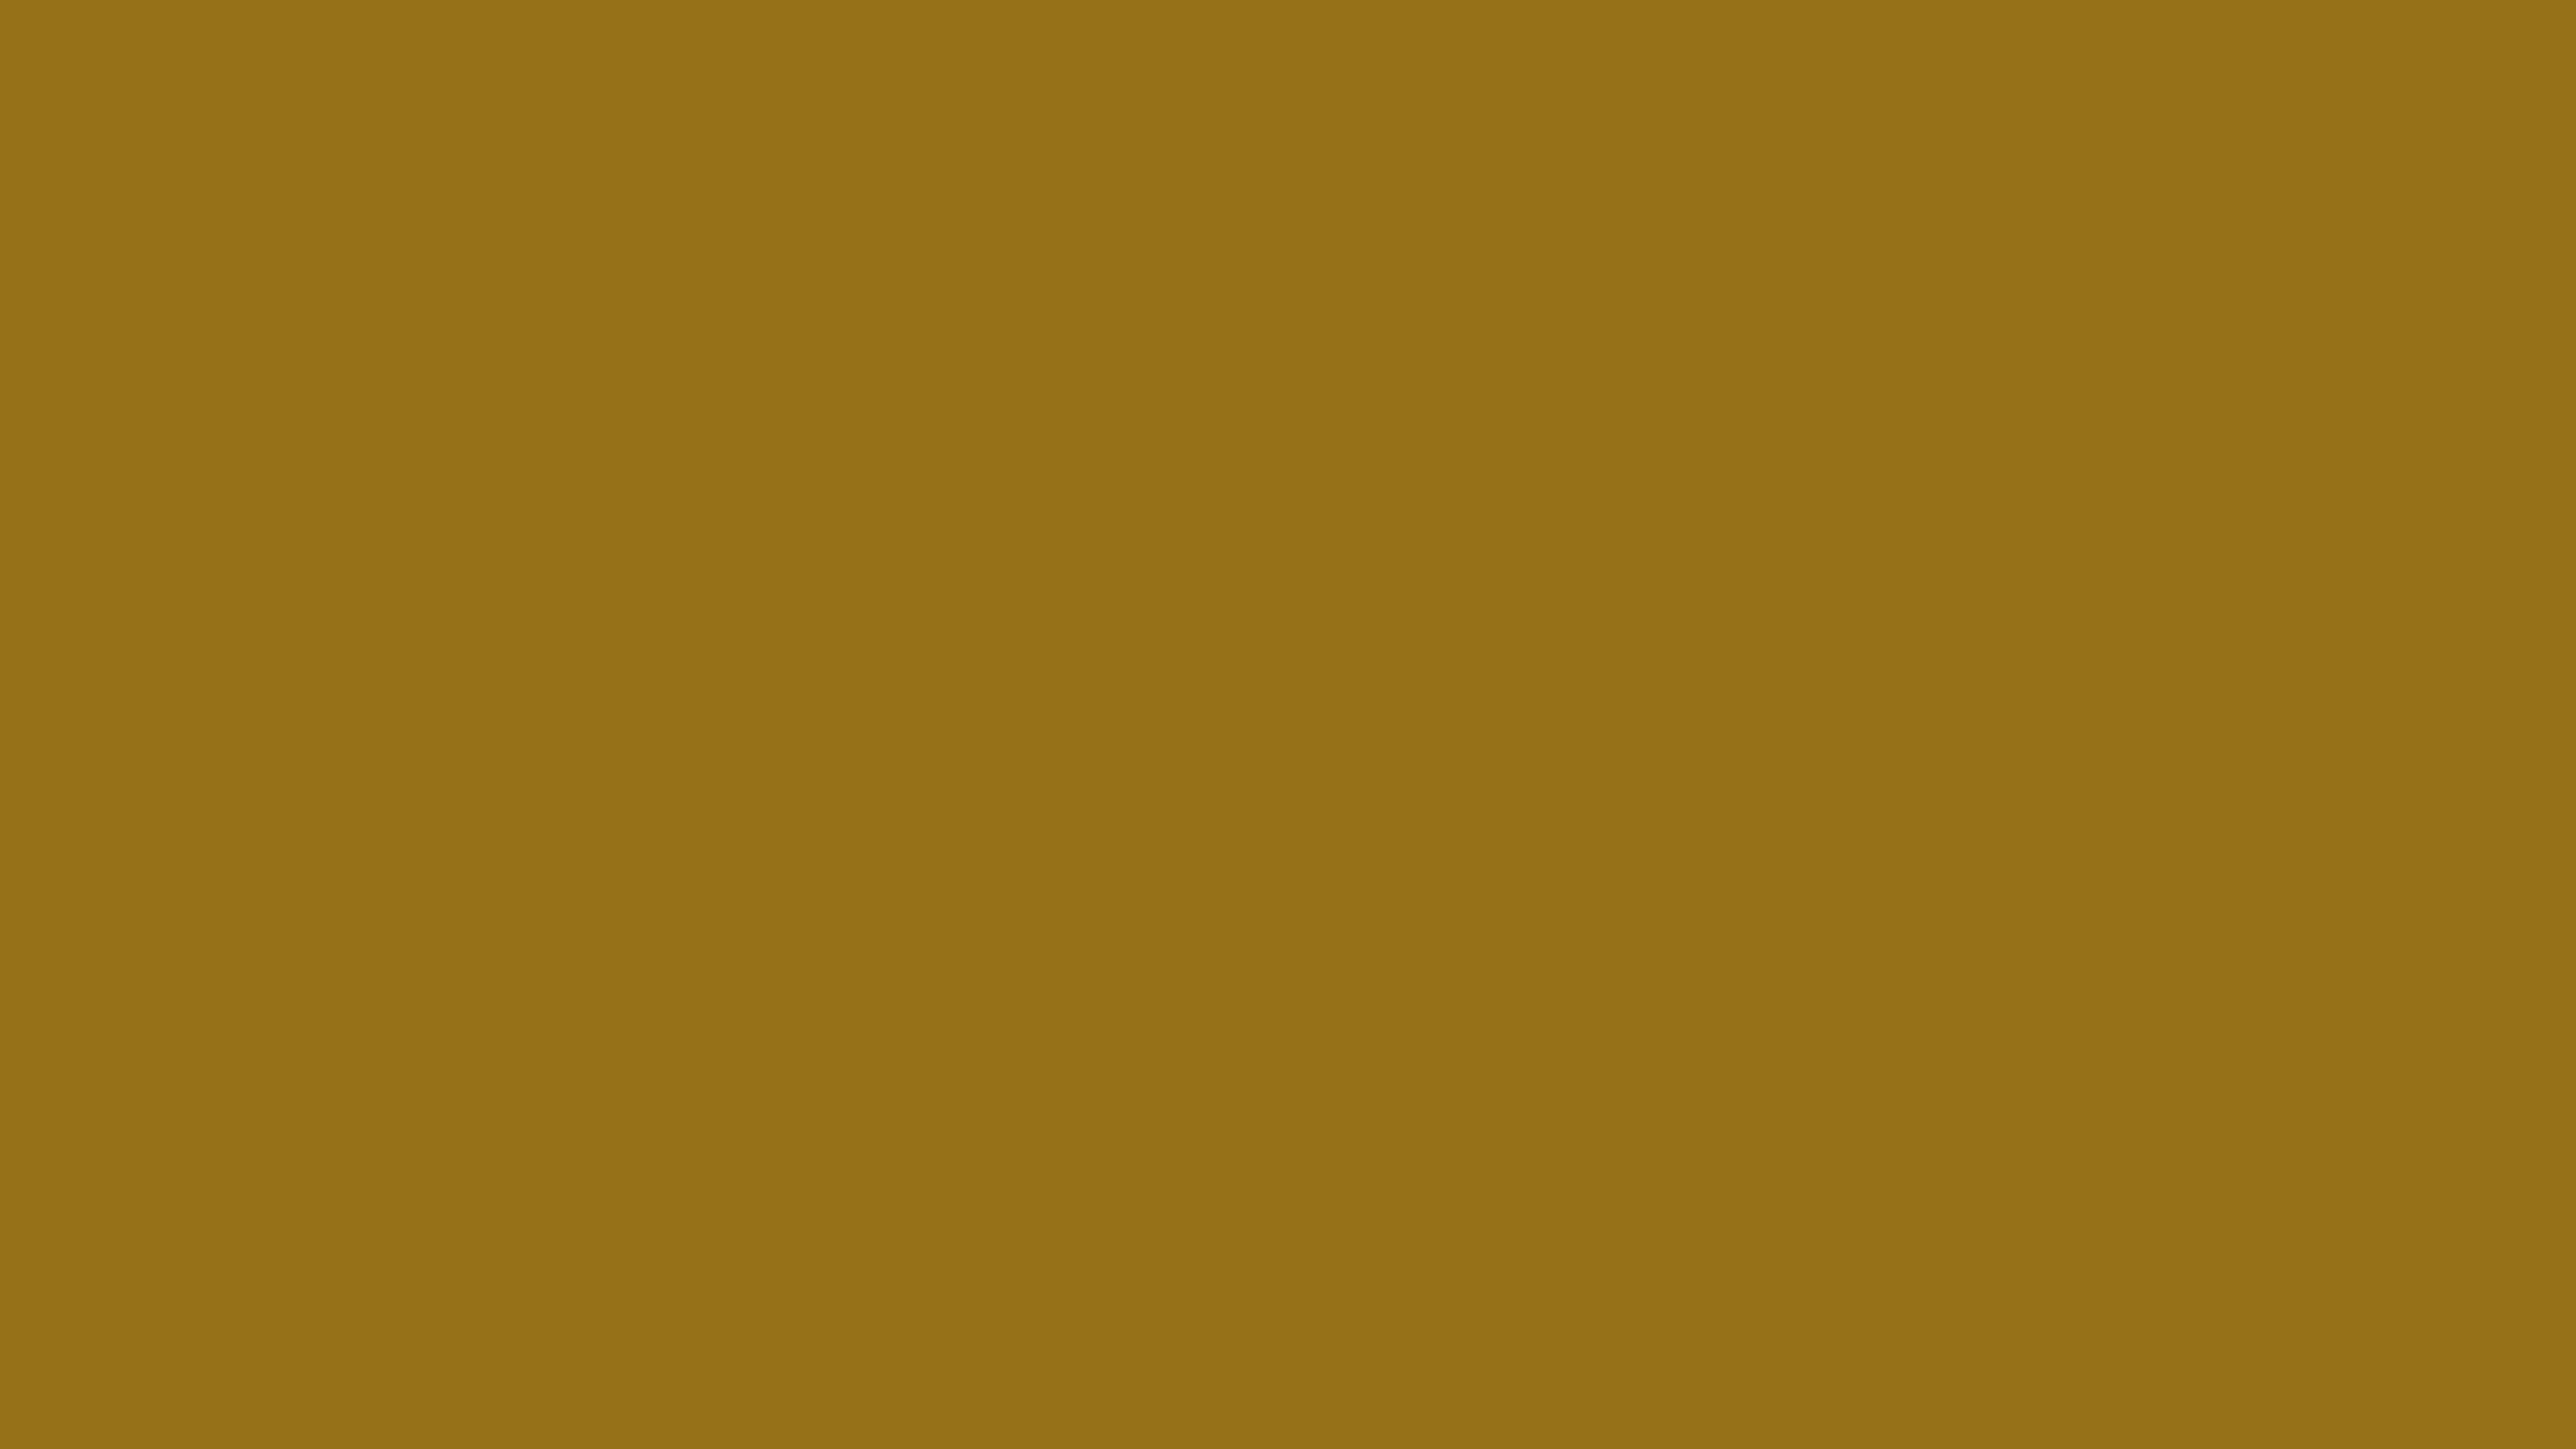 4096x2304 Bistre Brown Solid Color Background